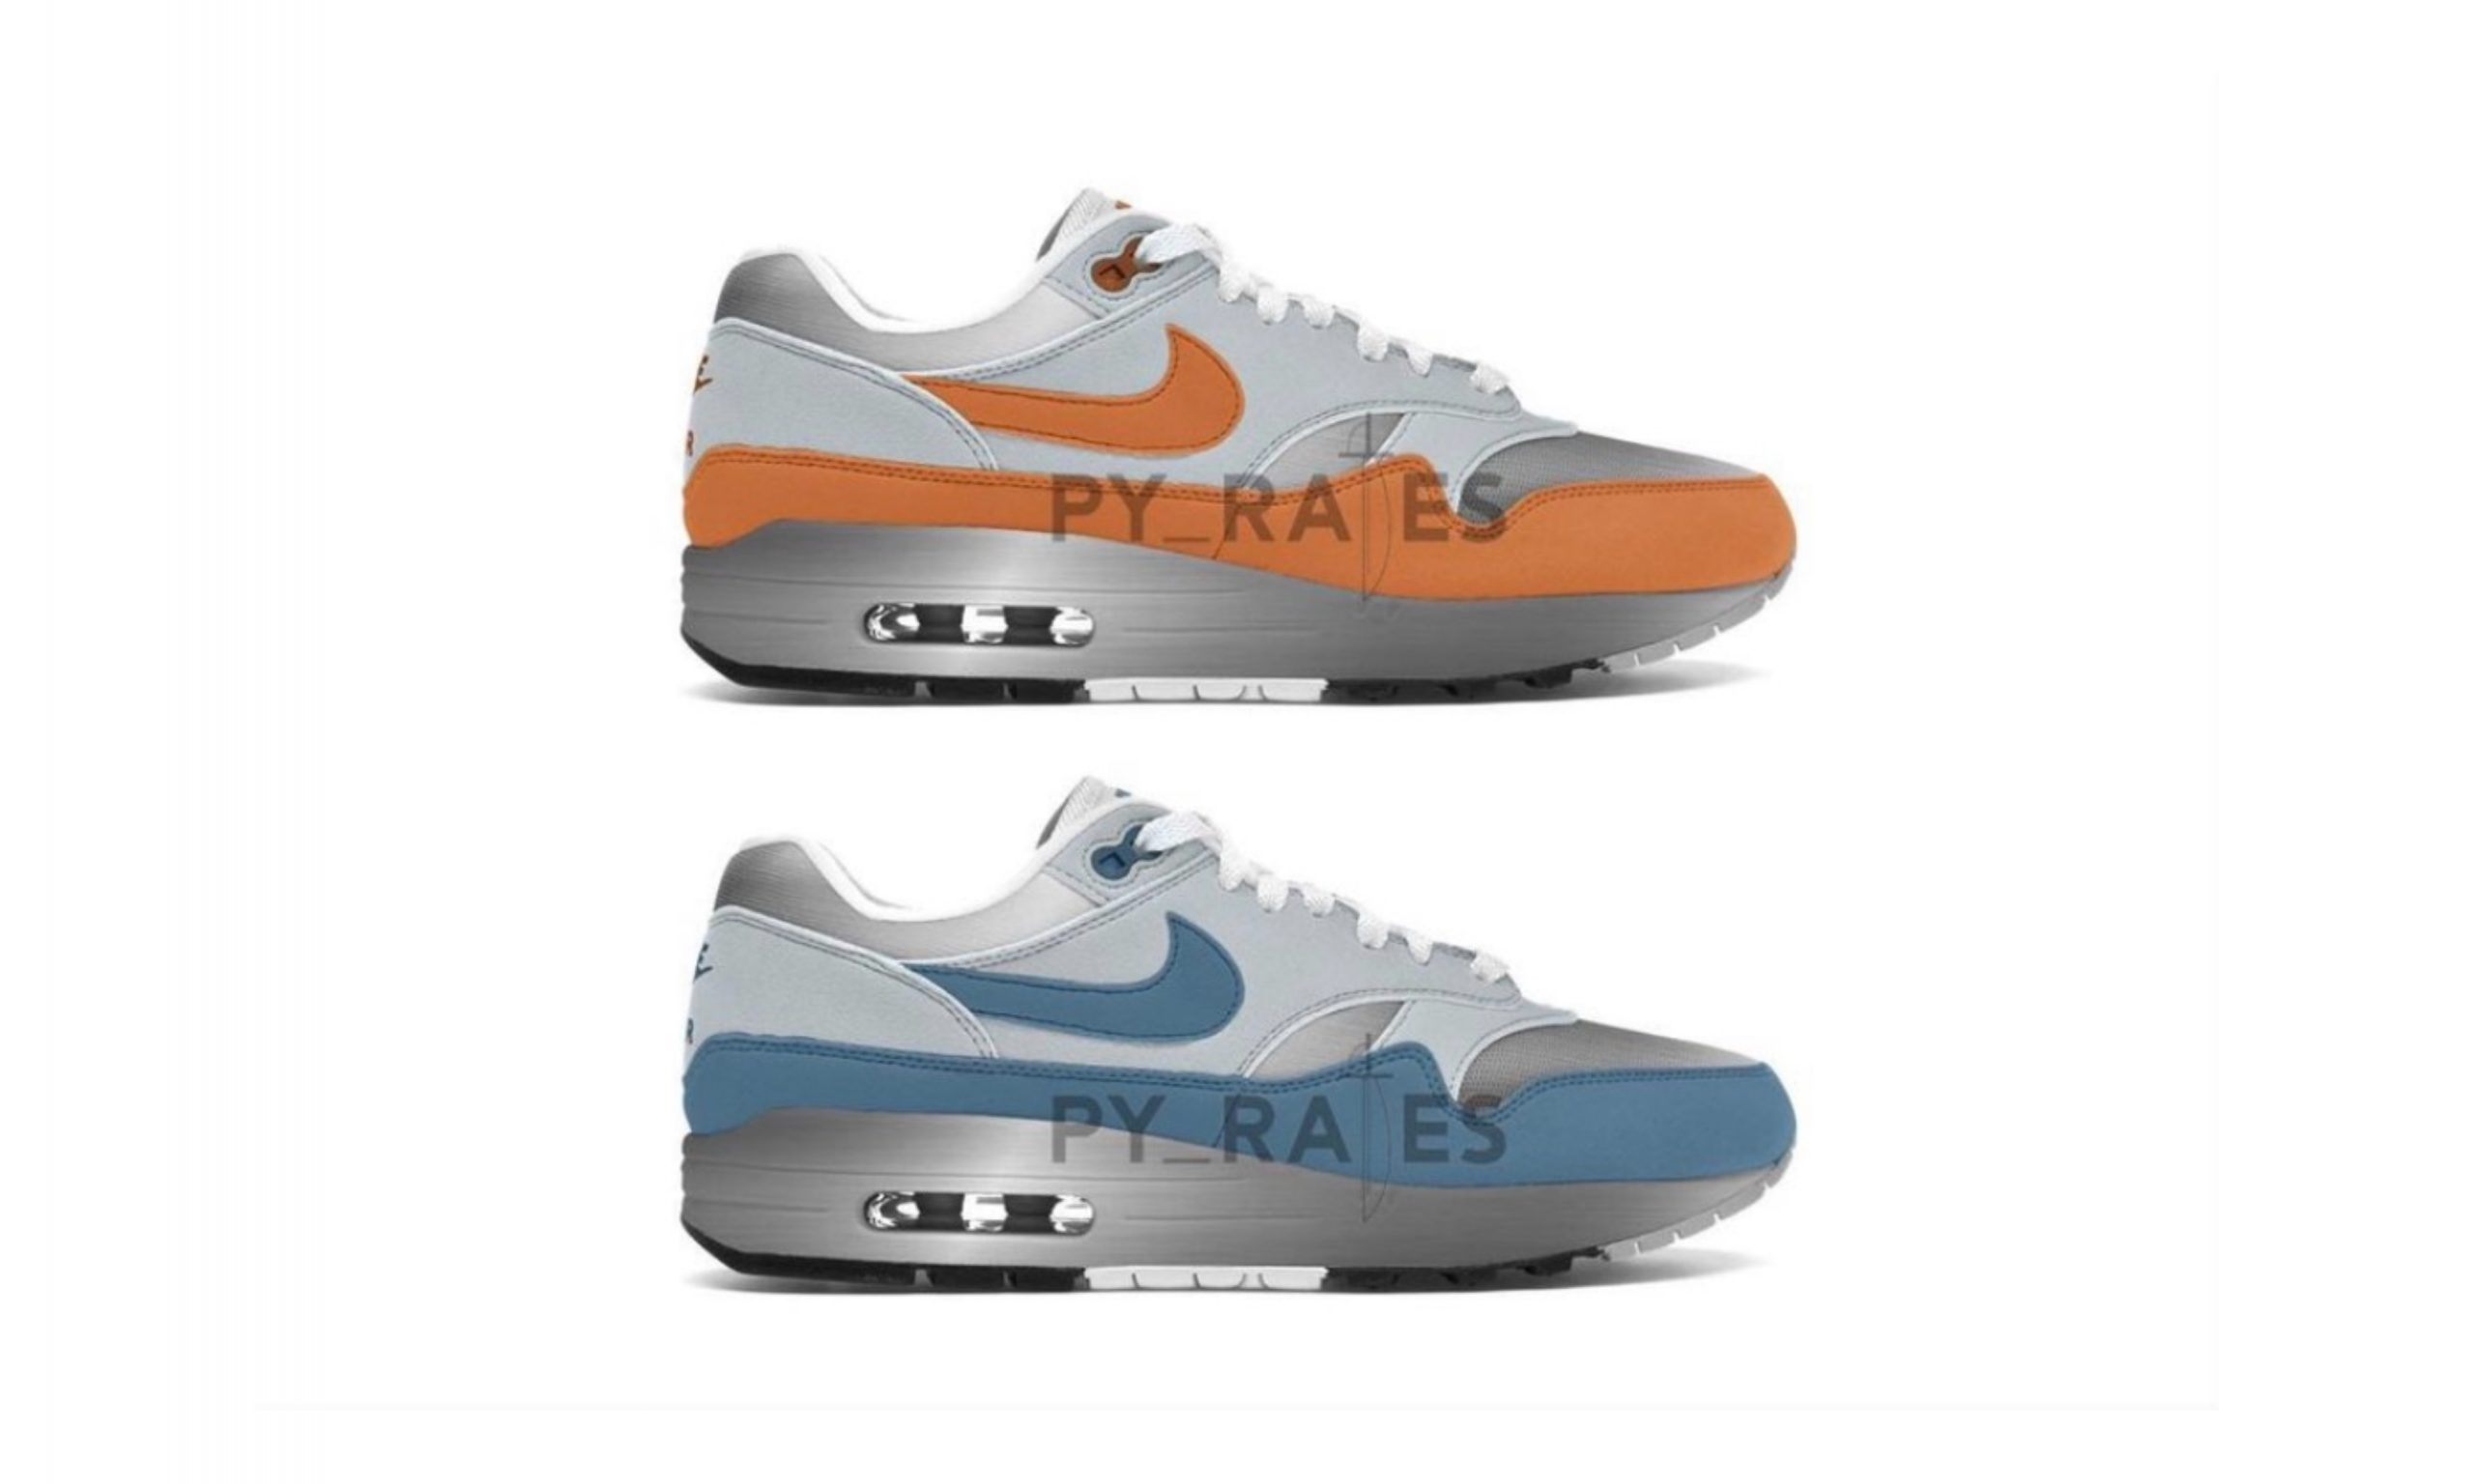 Patta x Nike Air Max 1 全新联乘公开